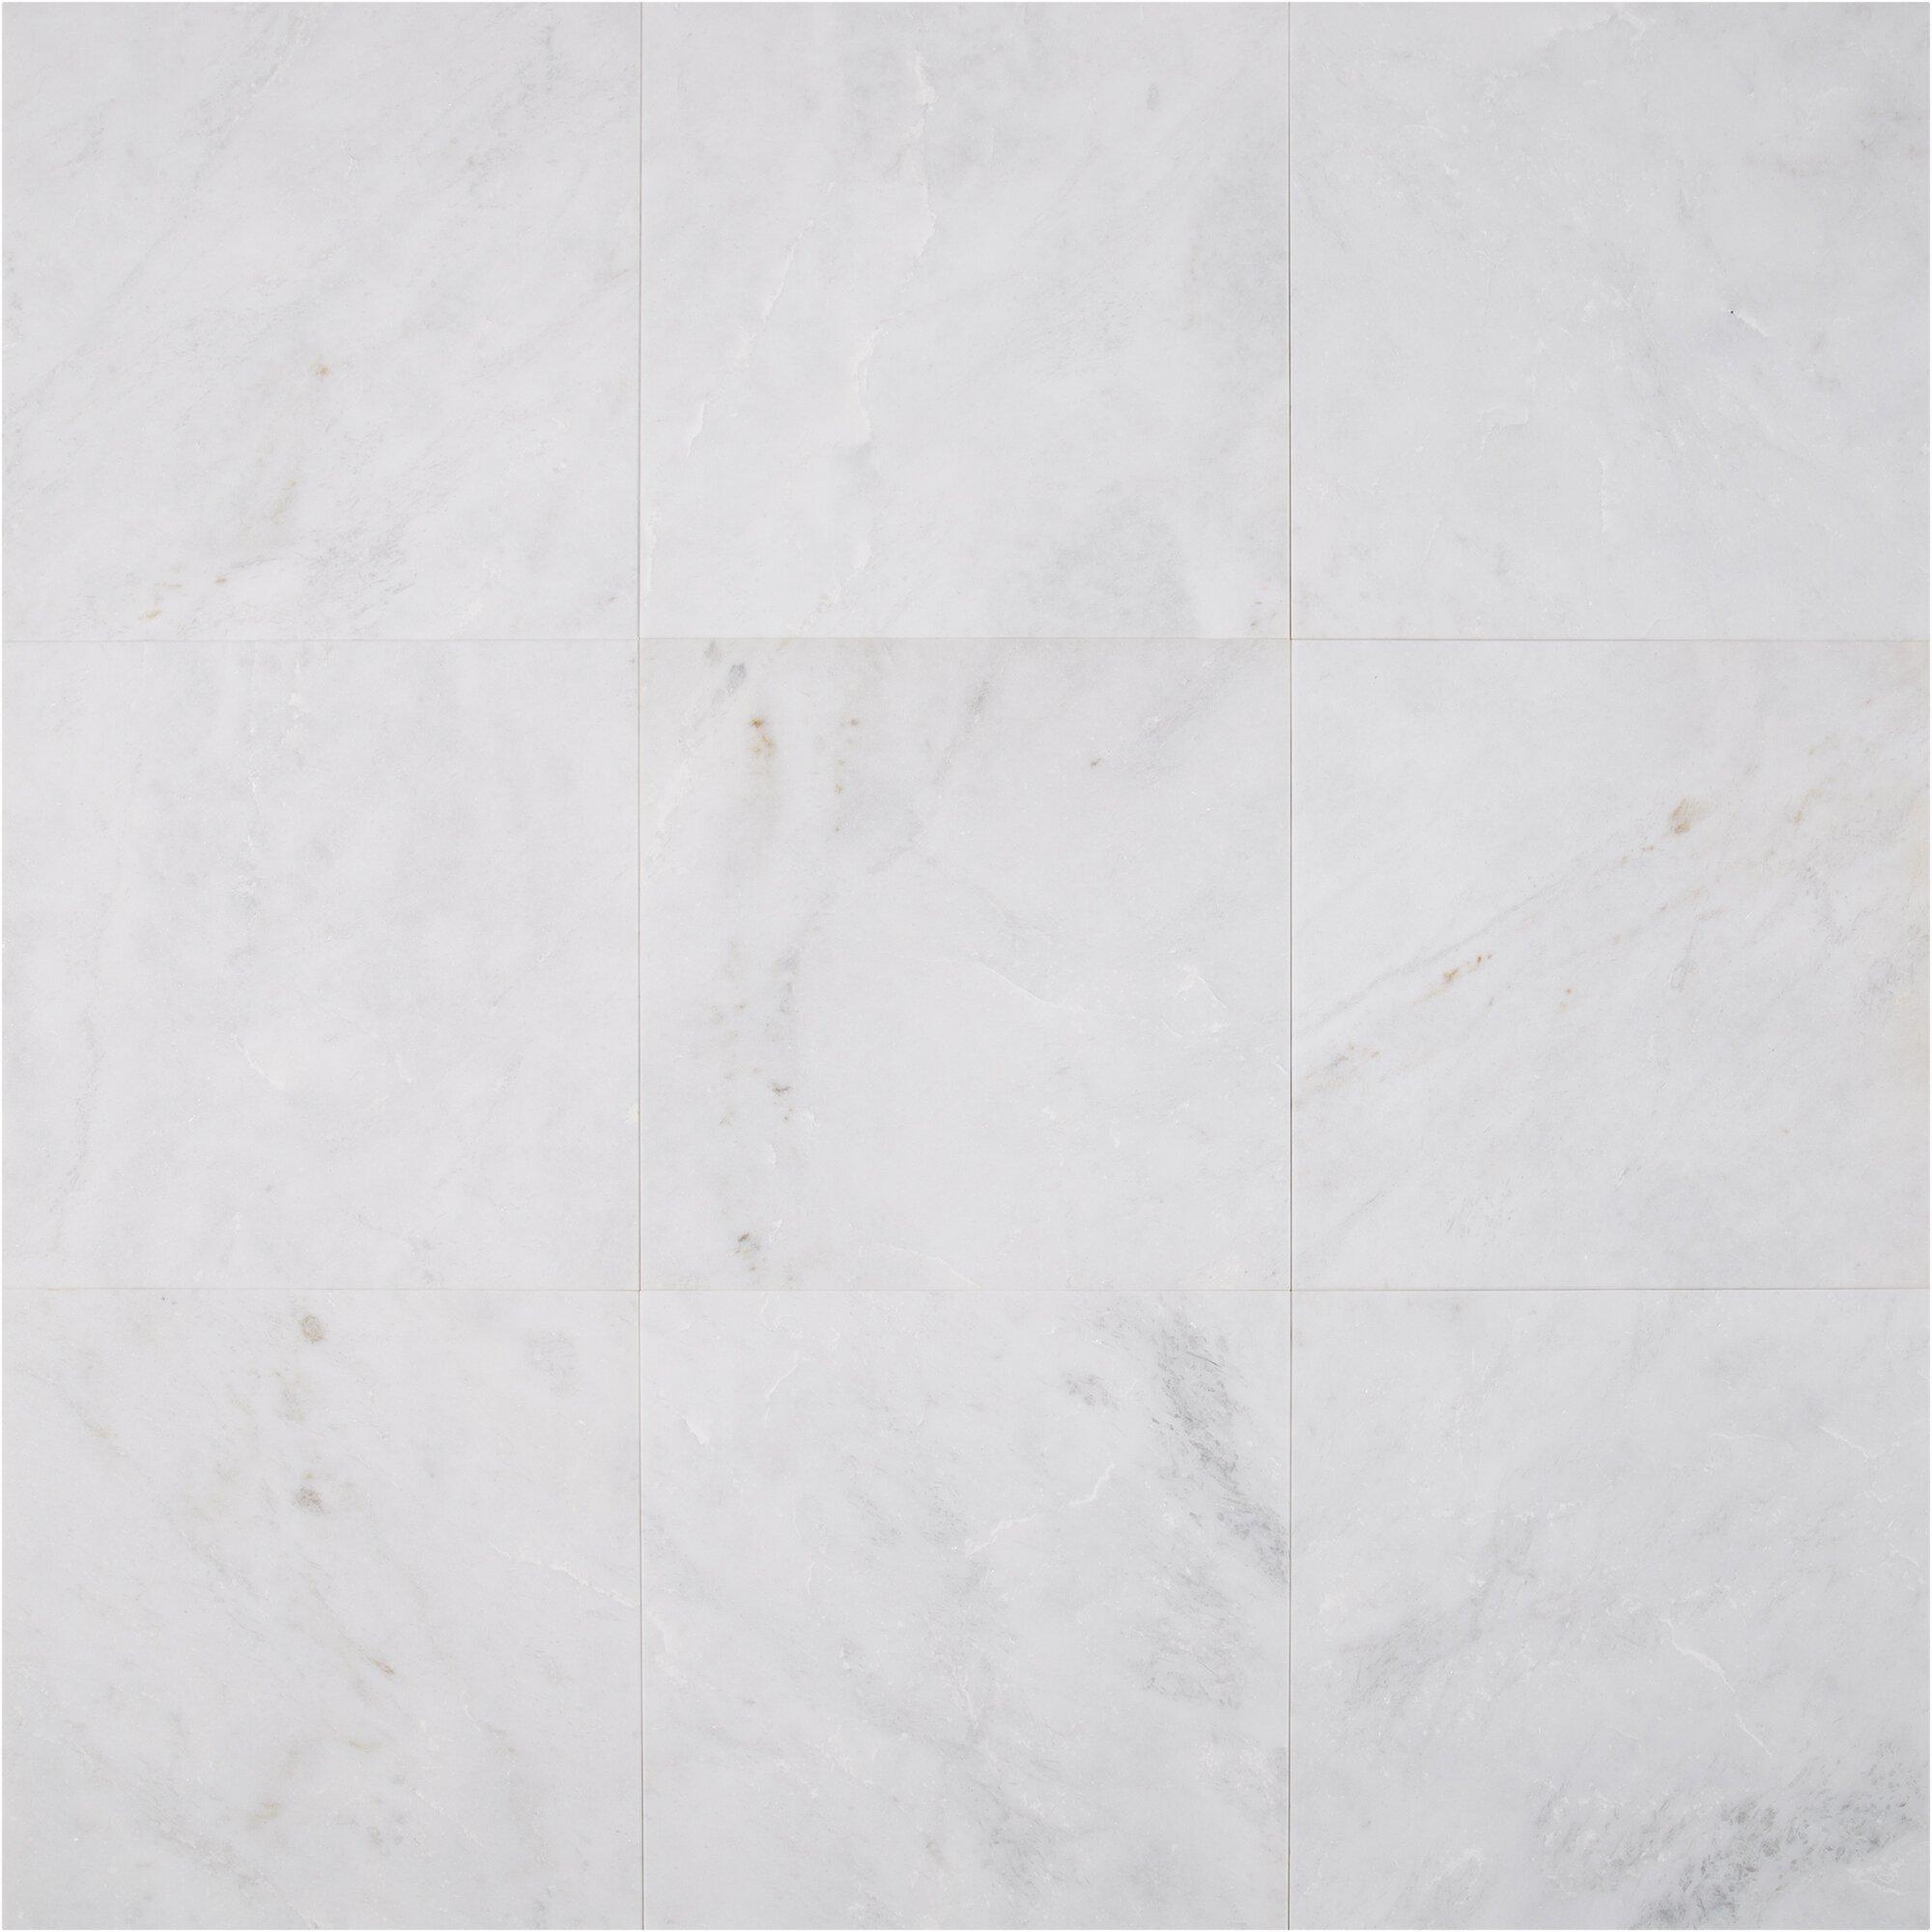 Arabescato Carrara Marble : Msi quot marble tile in arabescato carrara reviews